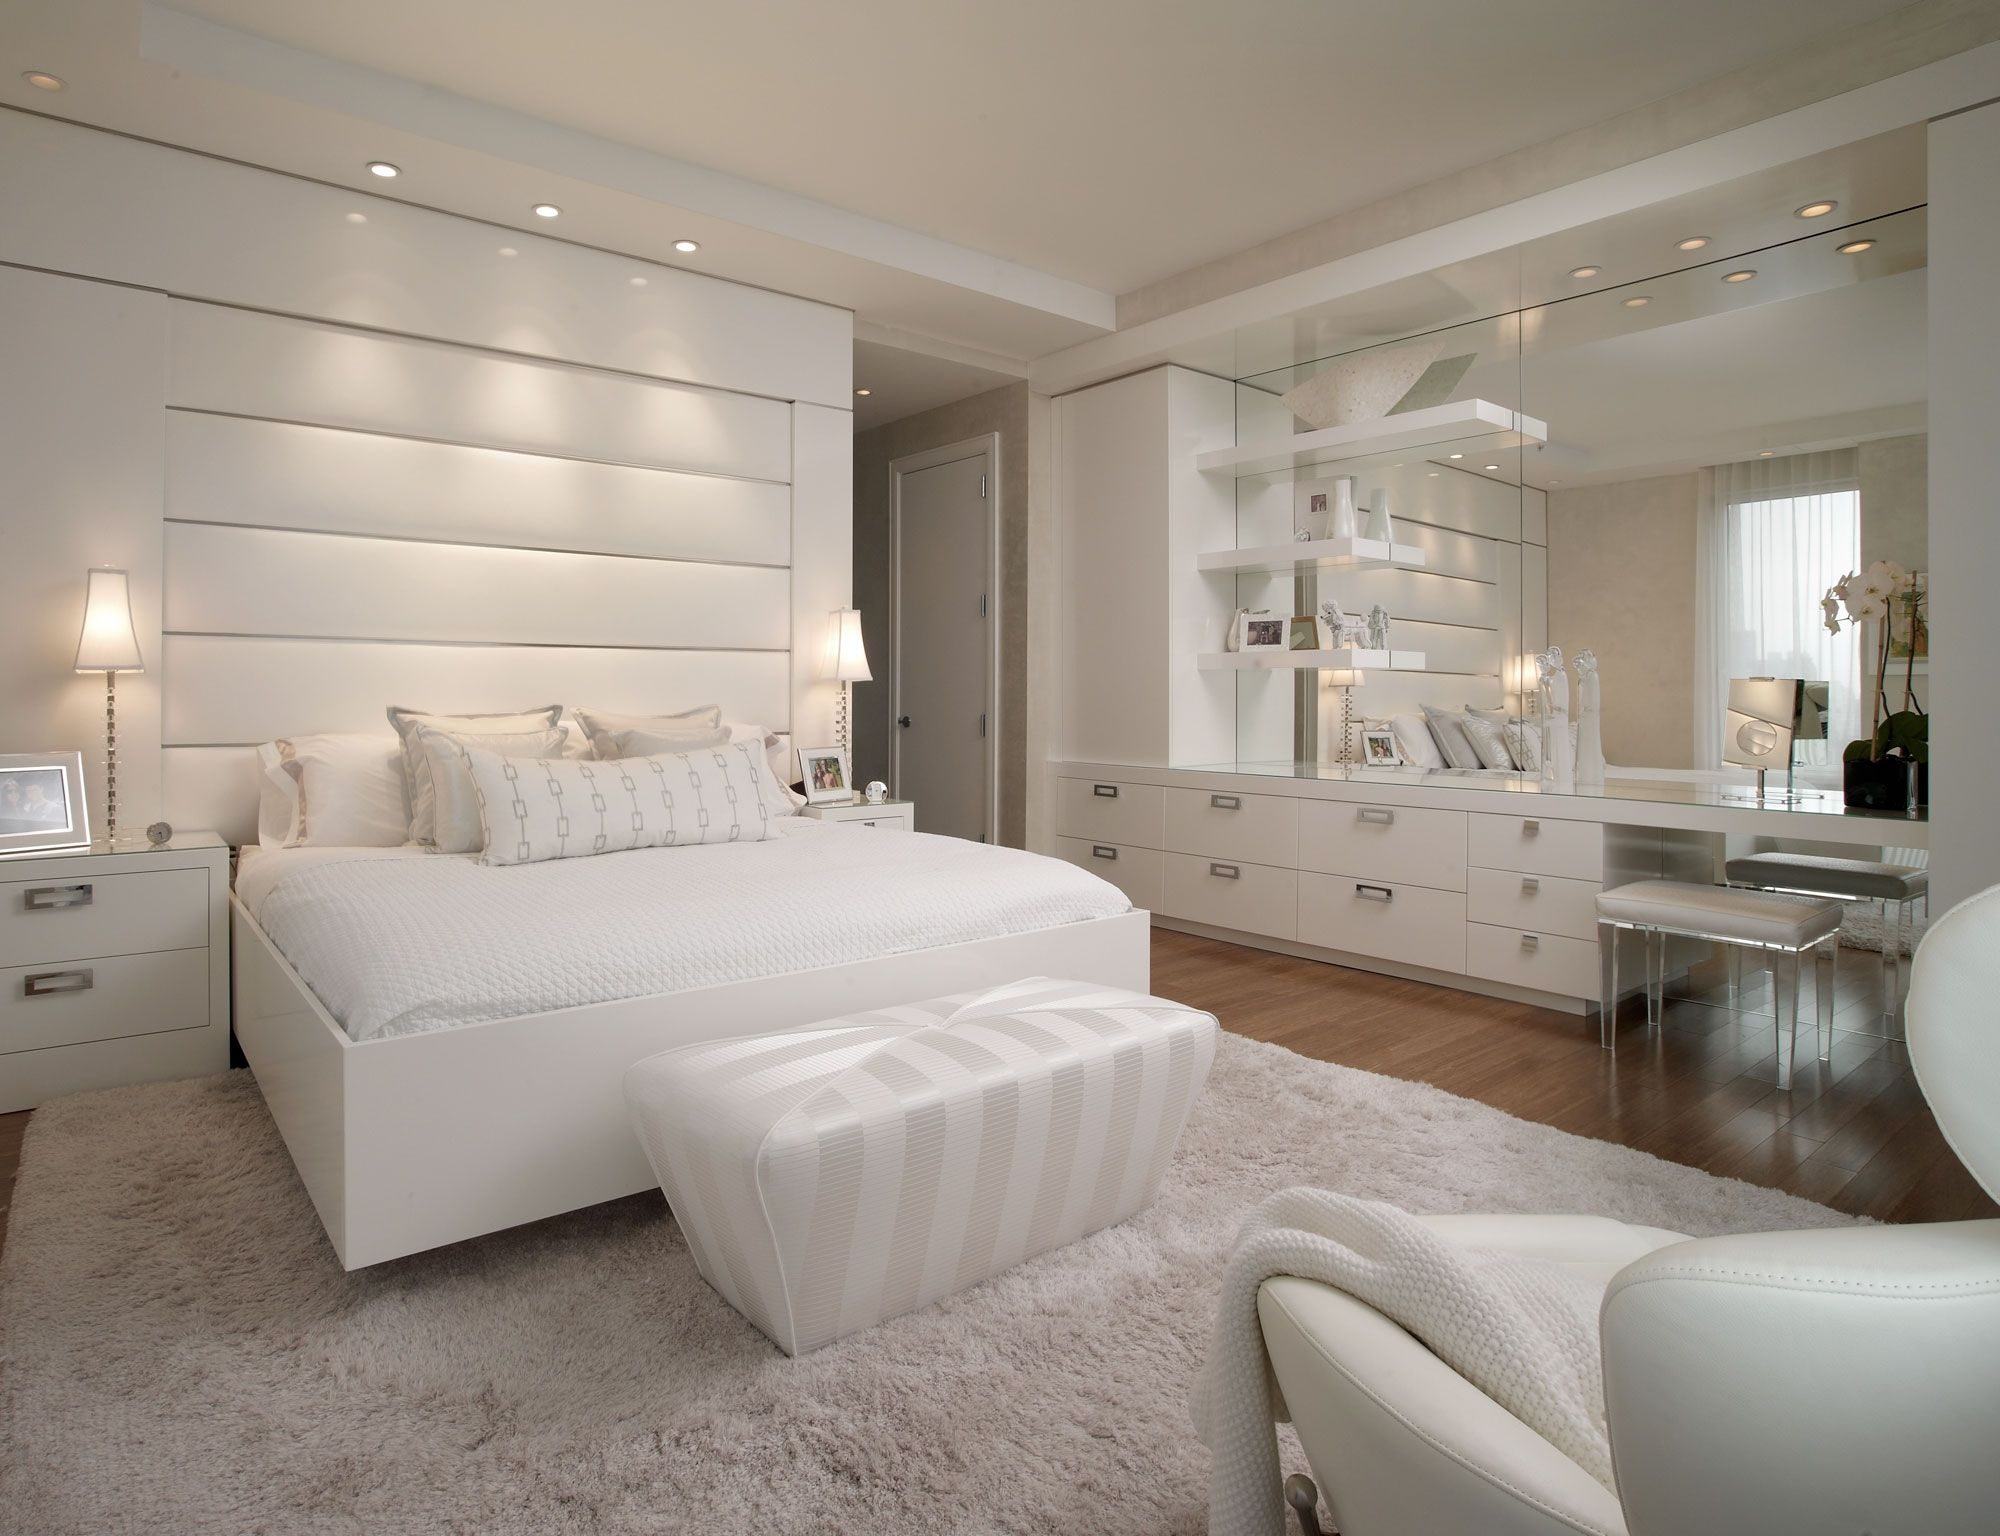 50 Cute Teenage Girl Bedroom Ideas White Master Bedroom